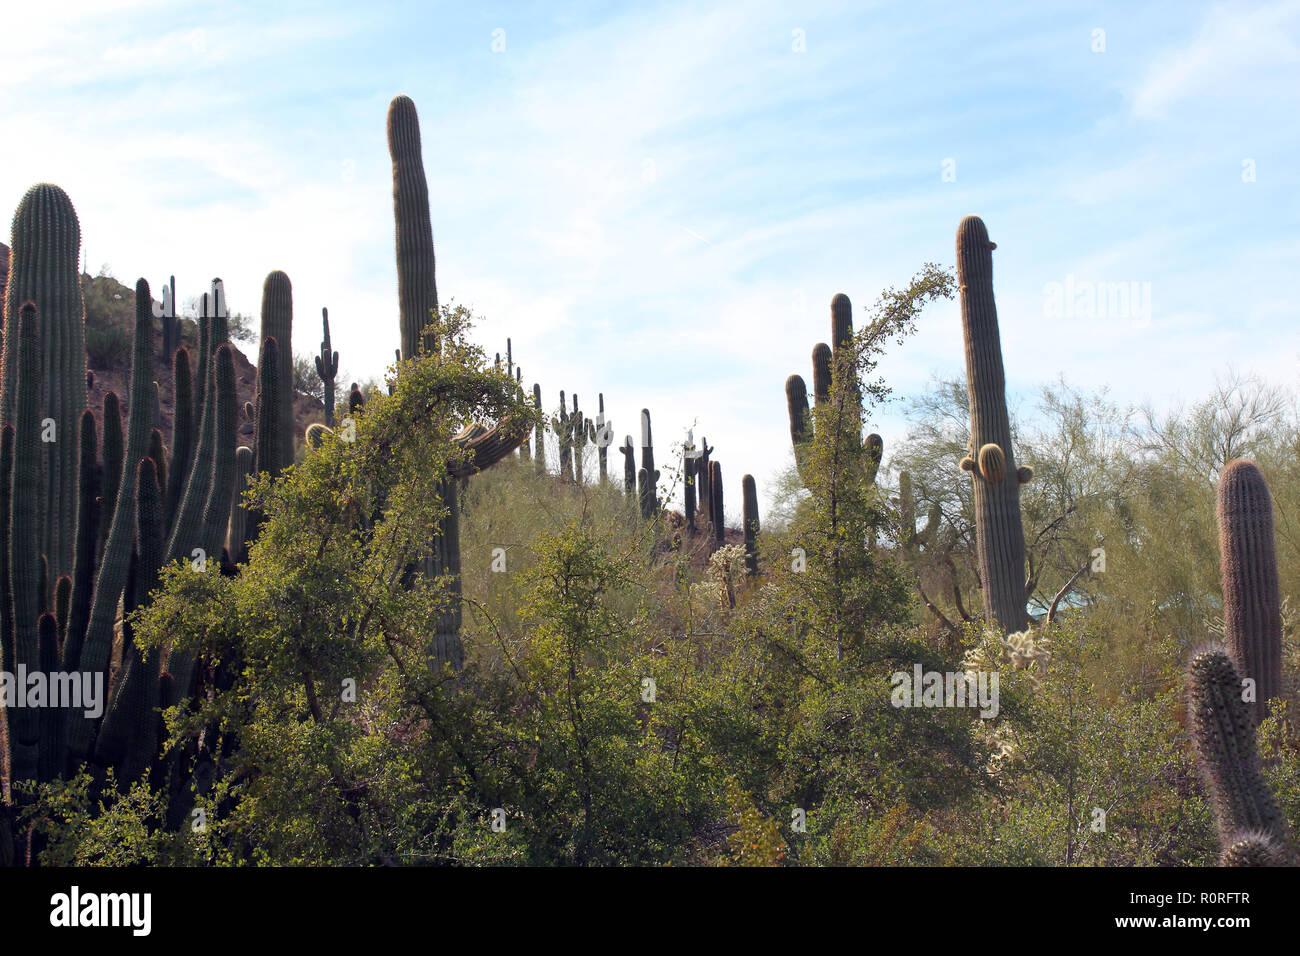 Mountainside covered with Saguro Cacti and shrub brush in the desert of Arizona, USA - Stock Image